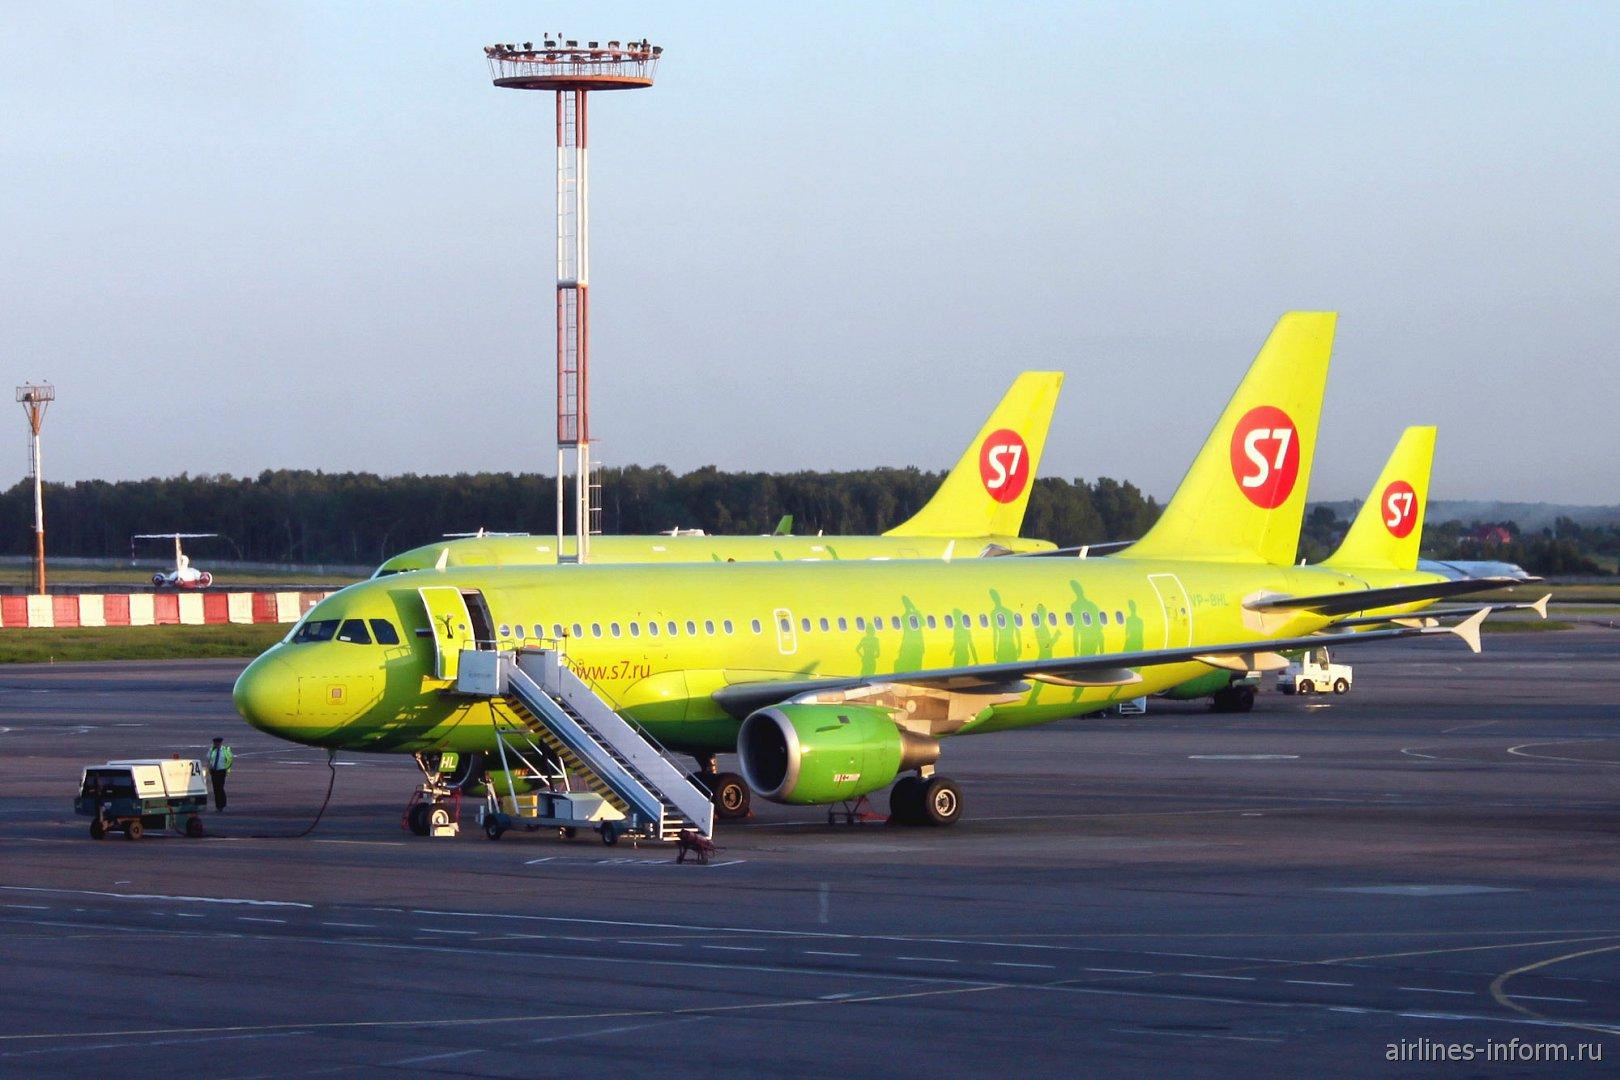 Самолет Airbus A319 авиакомпании S7 Airlines в аэропорту Домодедово